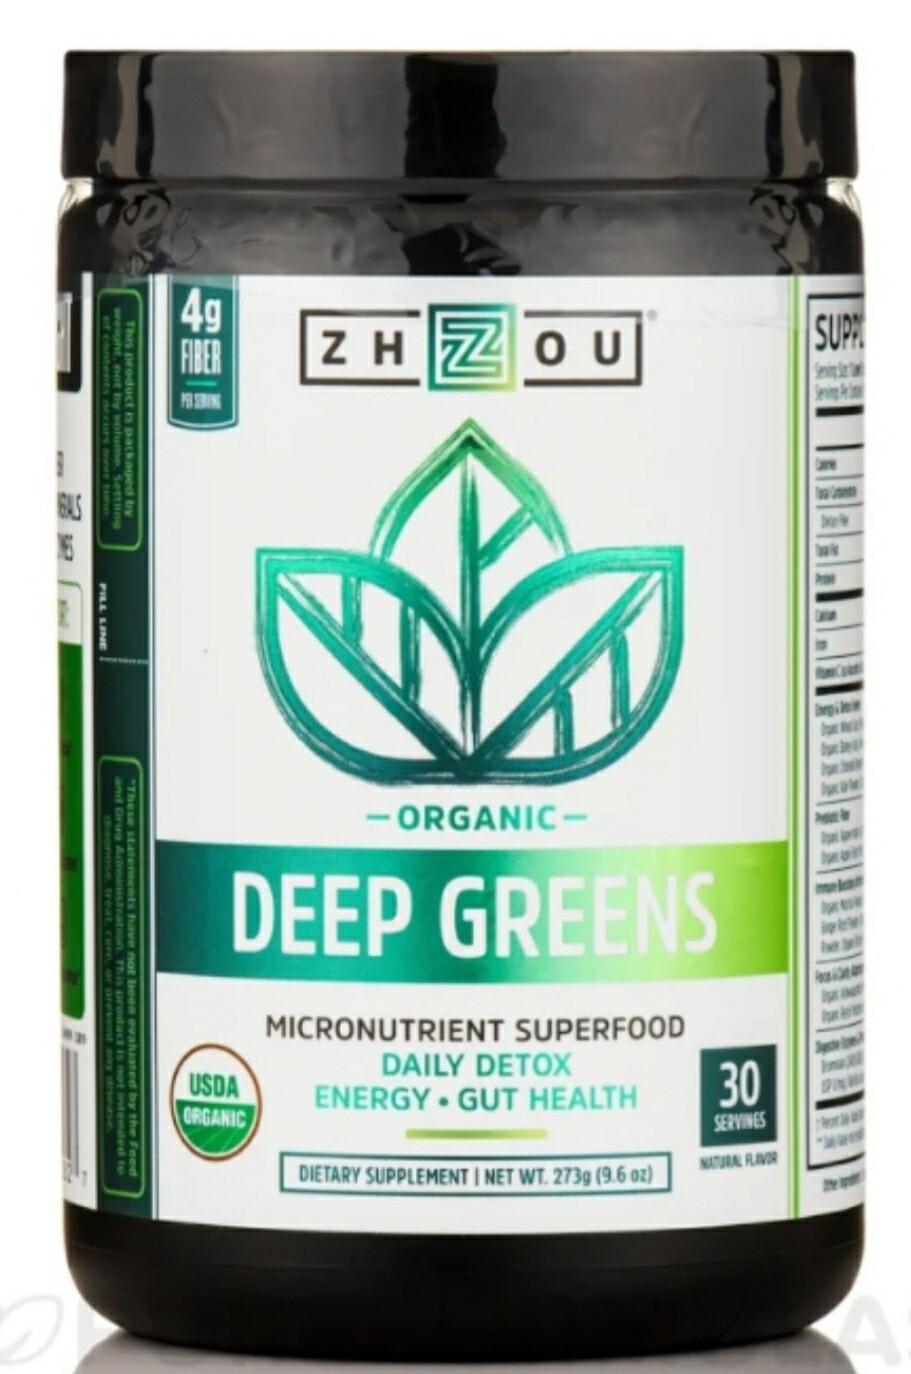 Organic Deep Greens 9.6oz